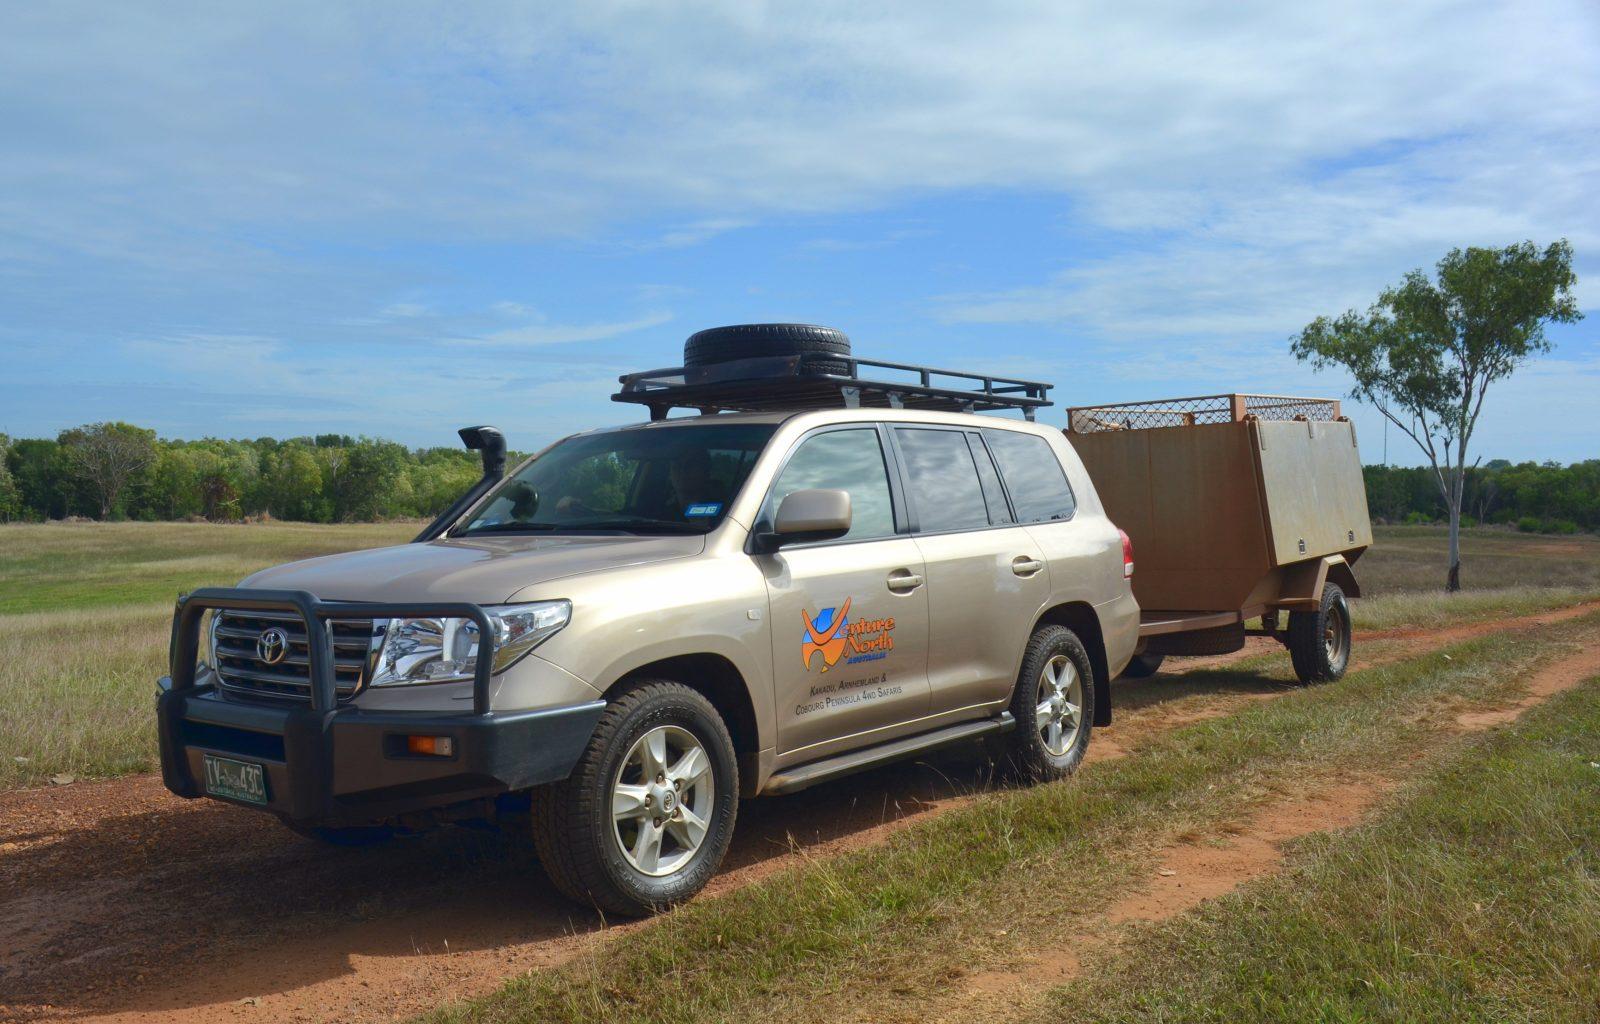 Venture North Tour Vehicle